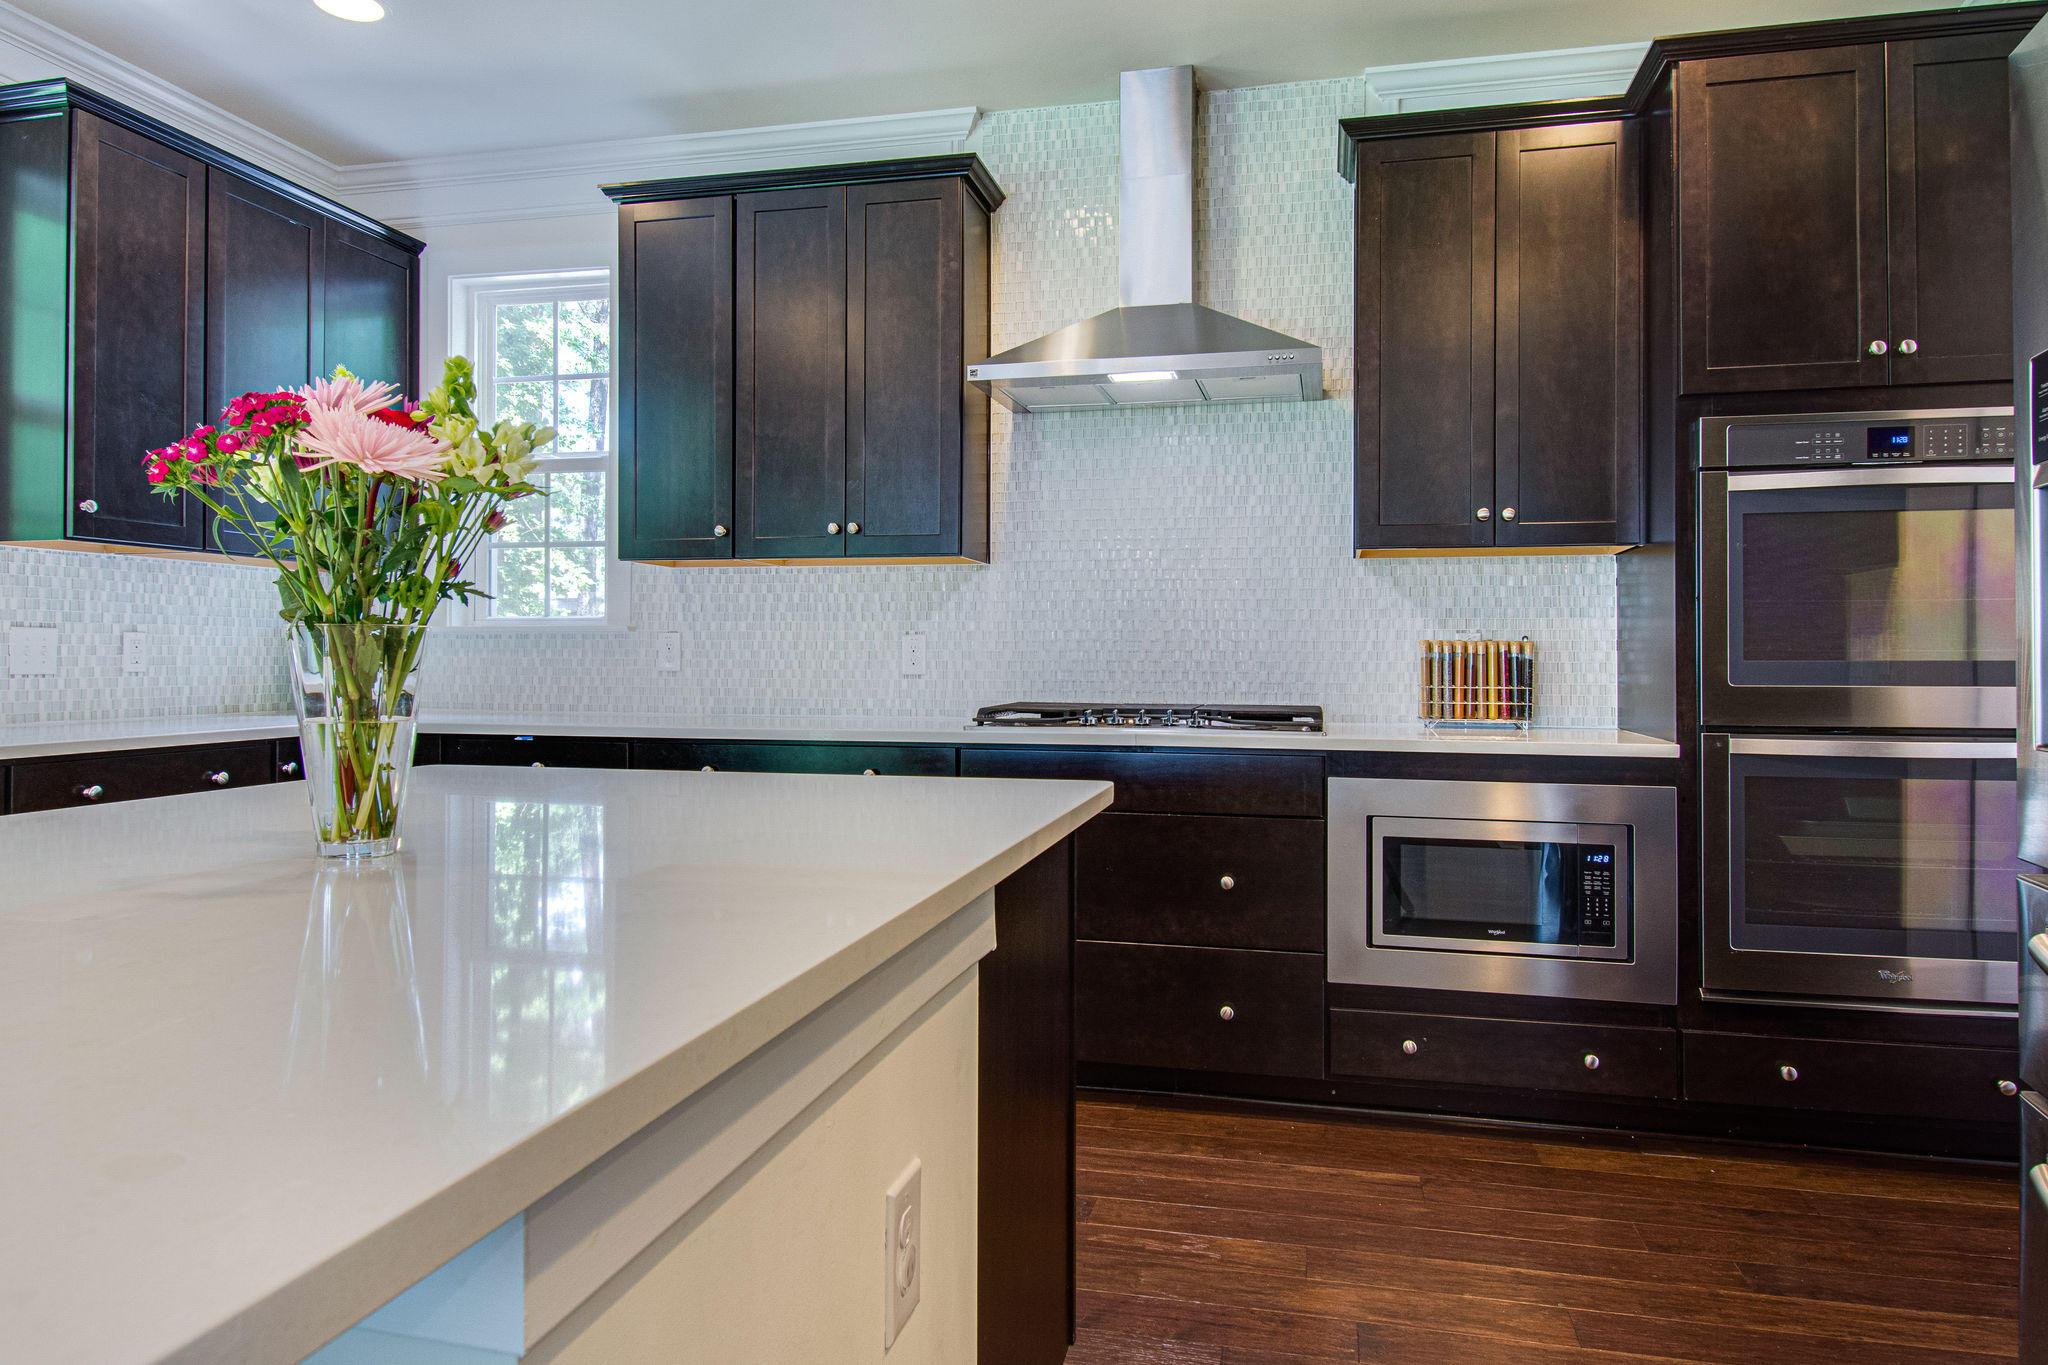 Magnolia Village Homes For Sale - 1261 Pearwood, Mount Pleasant, SC - 6